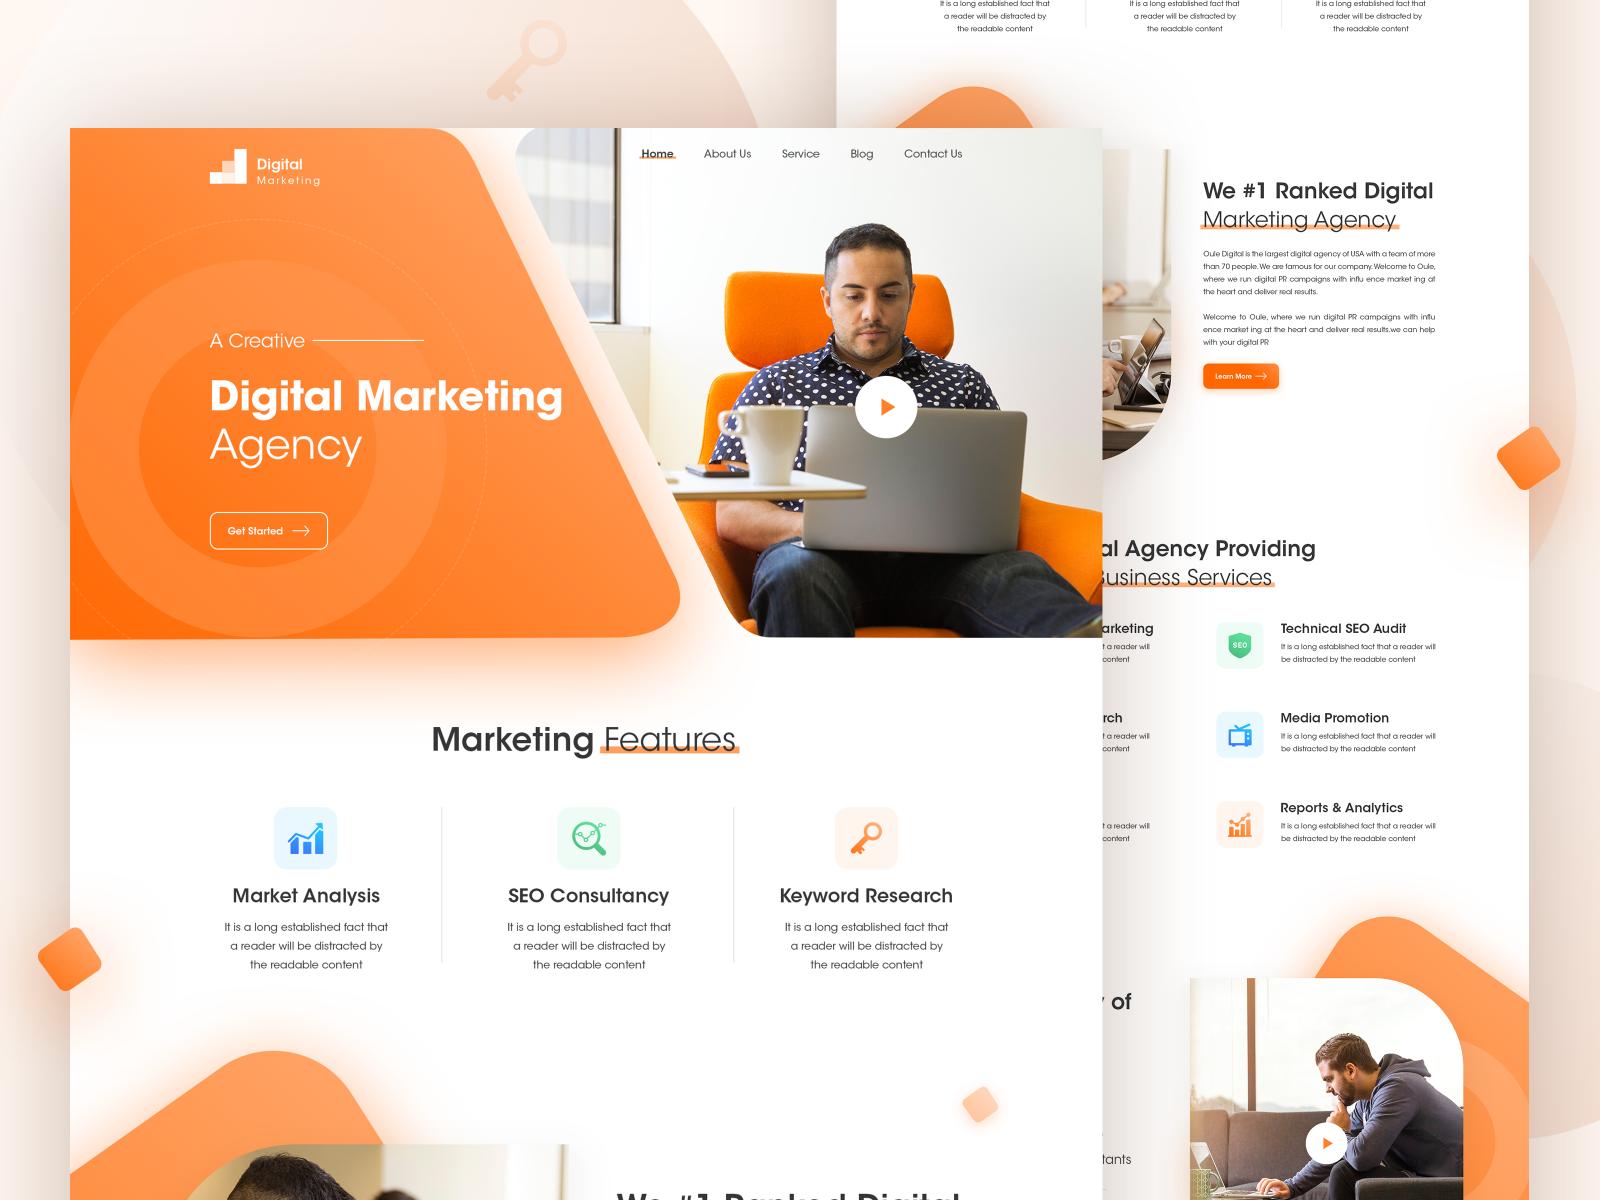 Digital Marketing Agency Landing Page Marketing Agency Website Digital Marketing Design Web Design Marketing